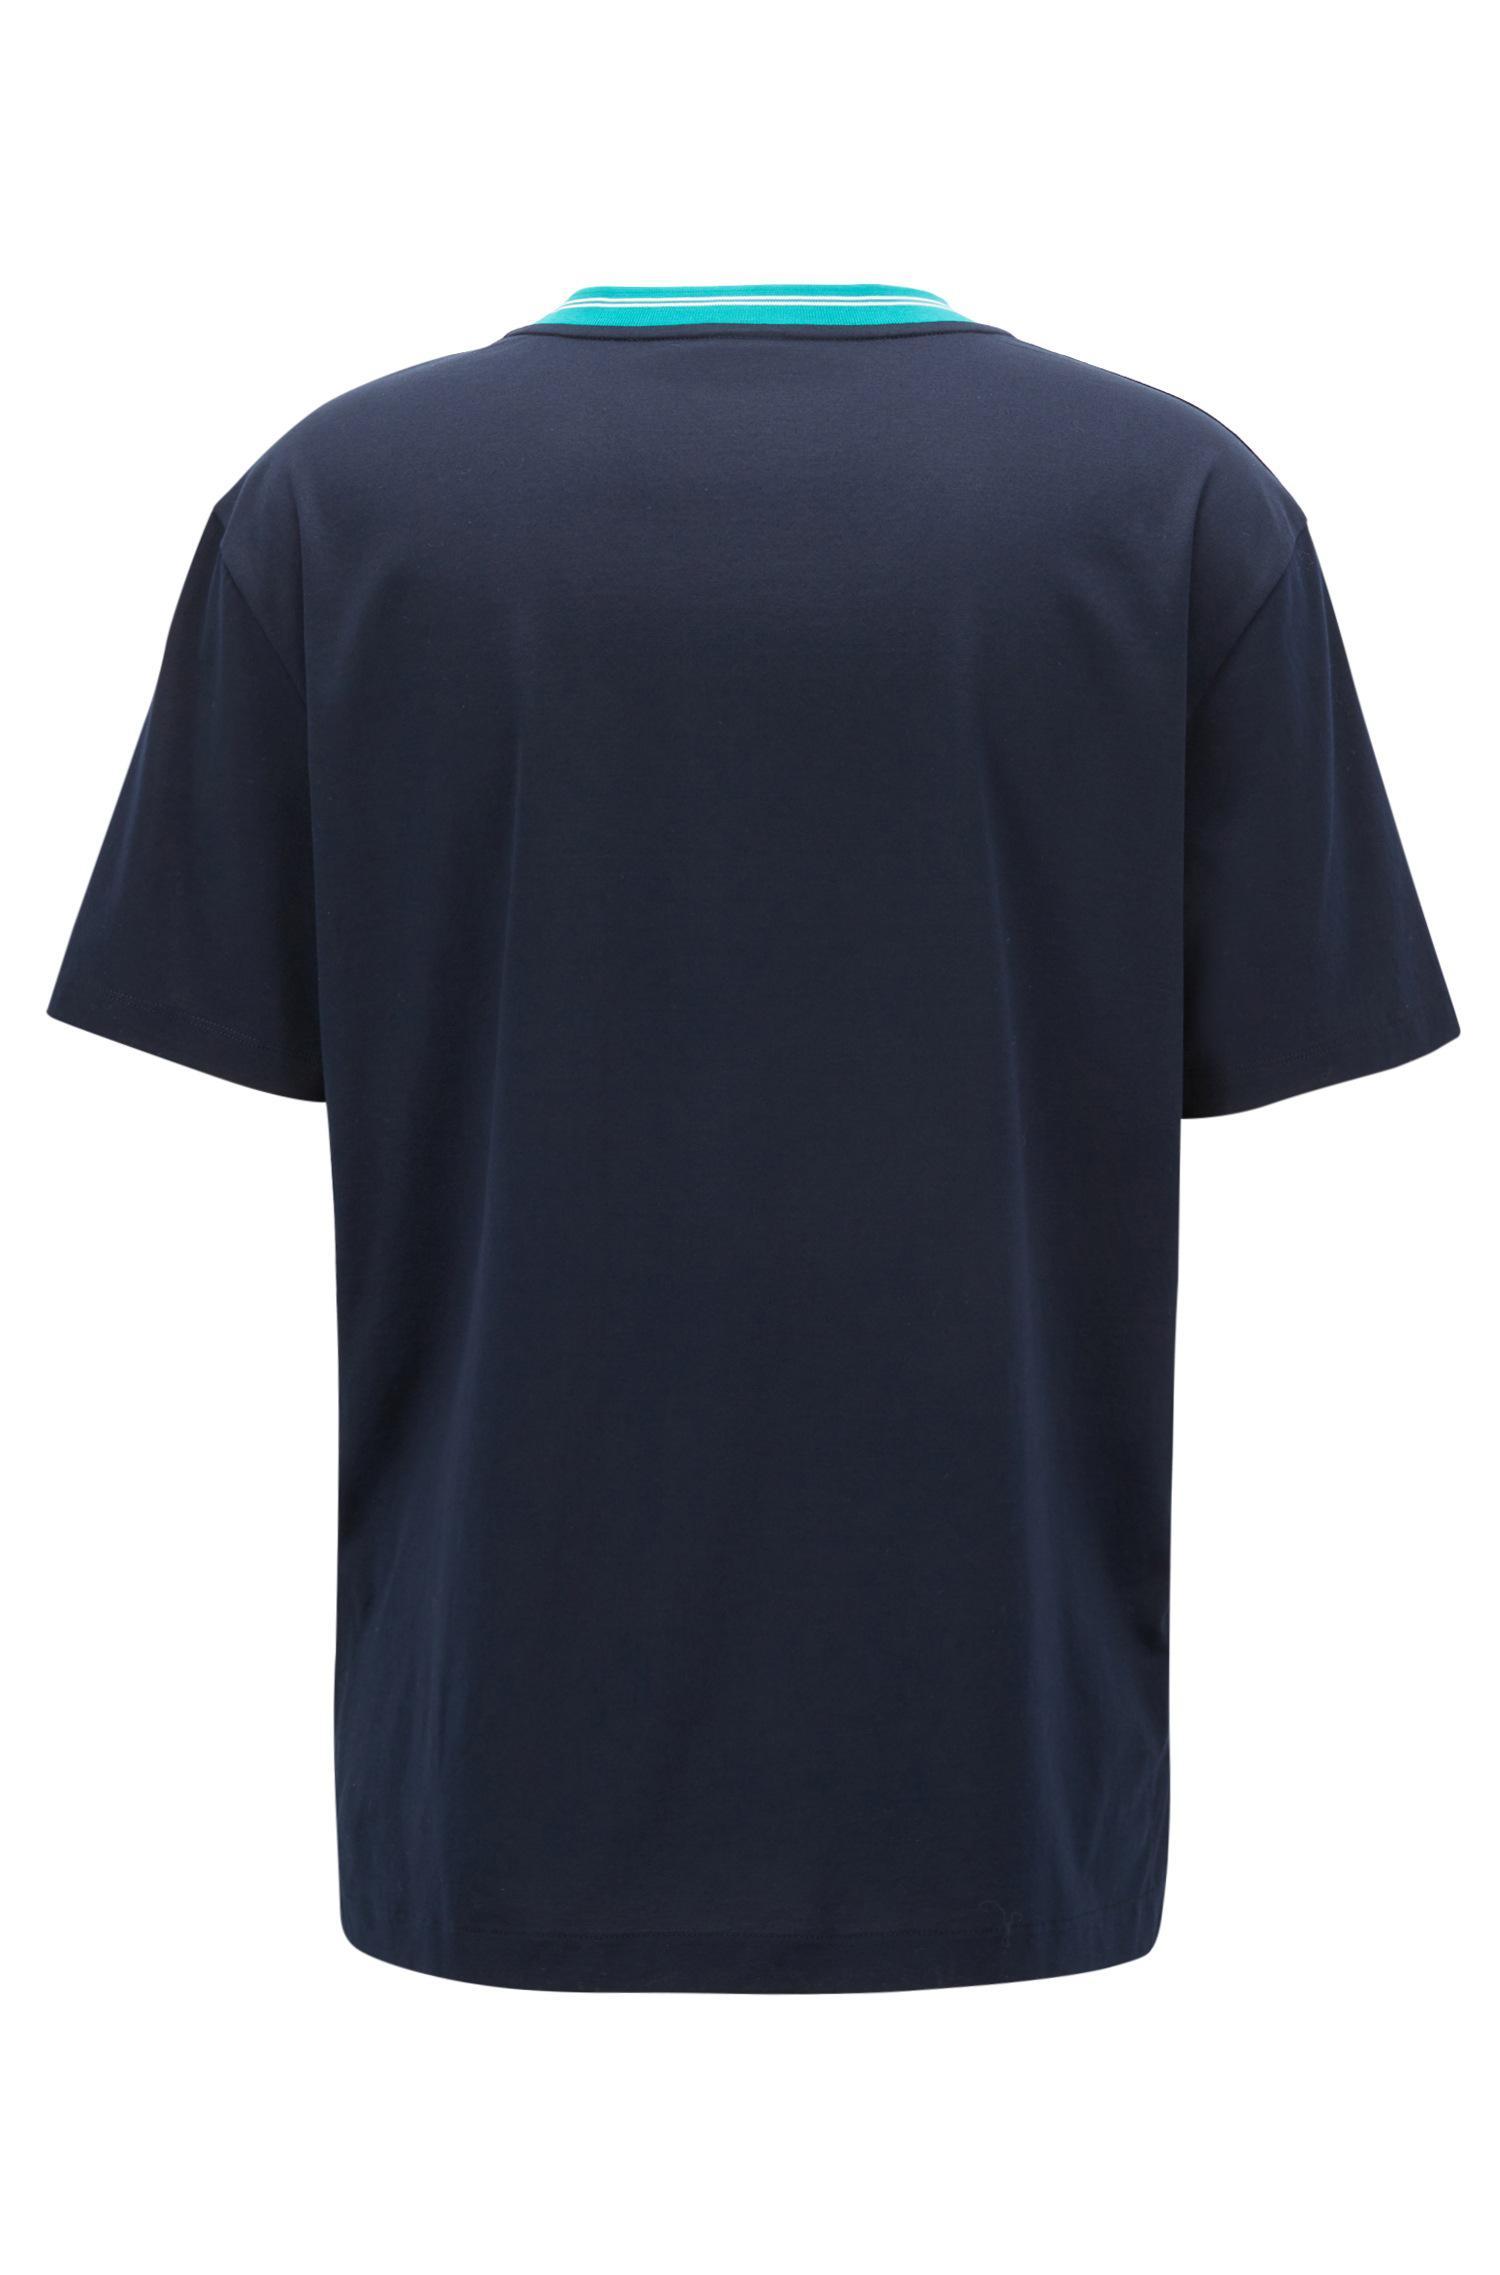 Mercerised-cotton T-shirt with contrast collar band BOSS 2018 New Cheap Online Cheap For Cheap z1LrnC2sp